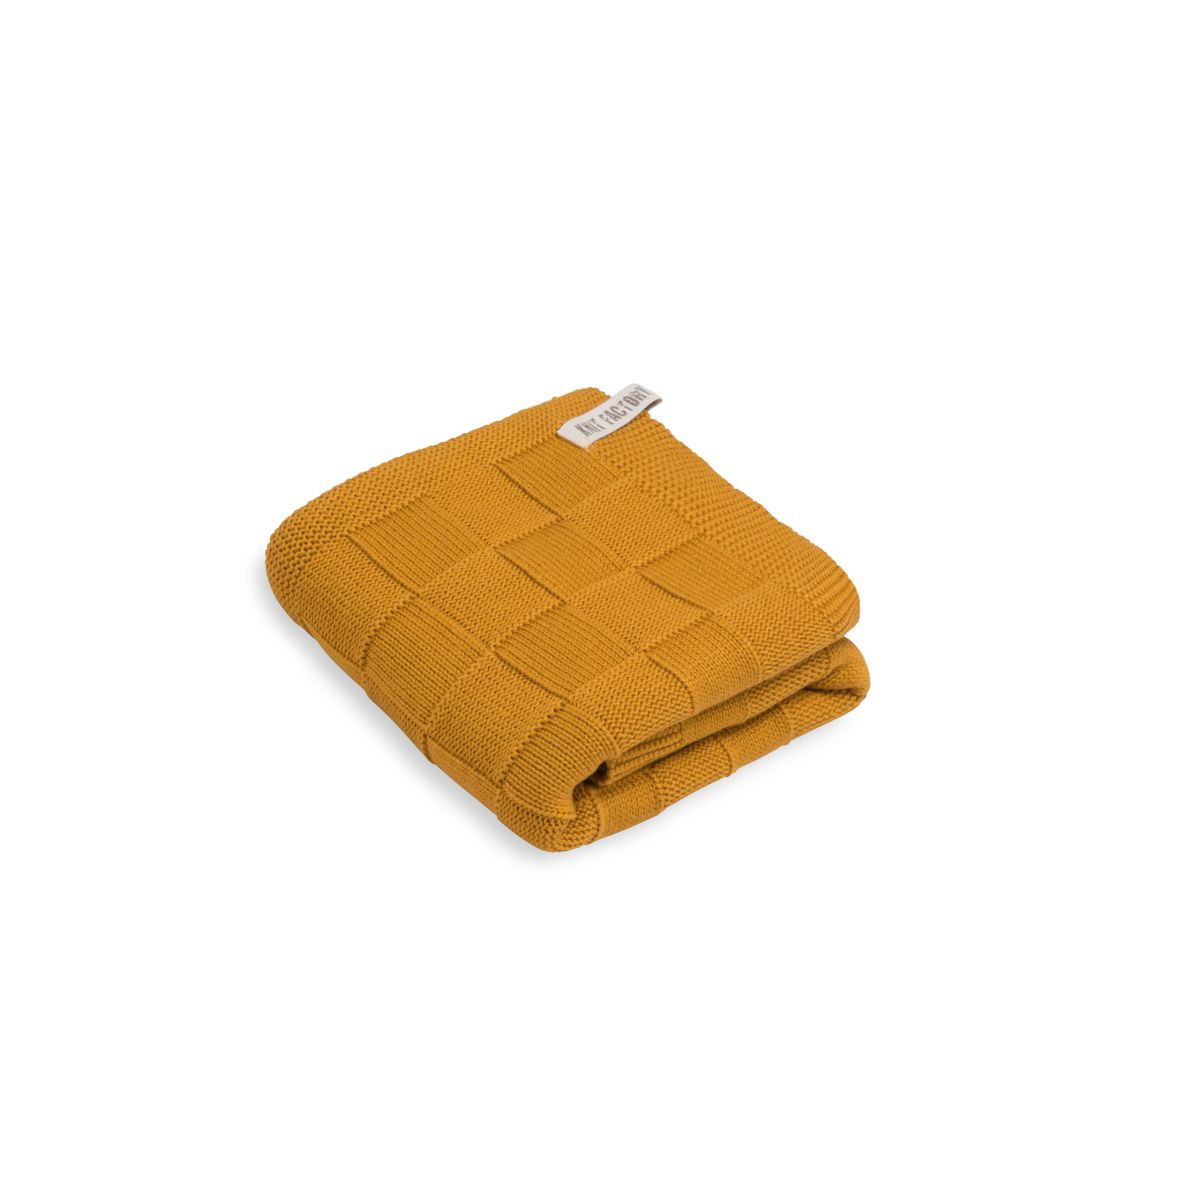 knit factory kf20222501749 handdoek ivy oker 50x100 1